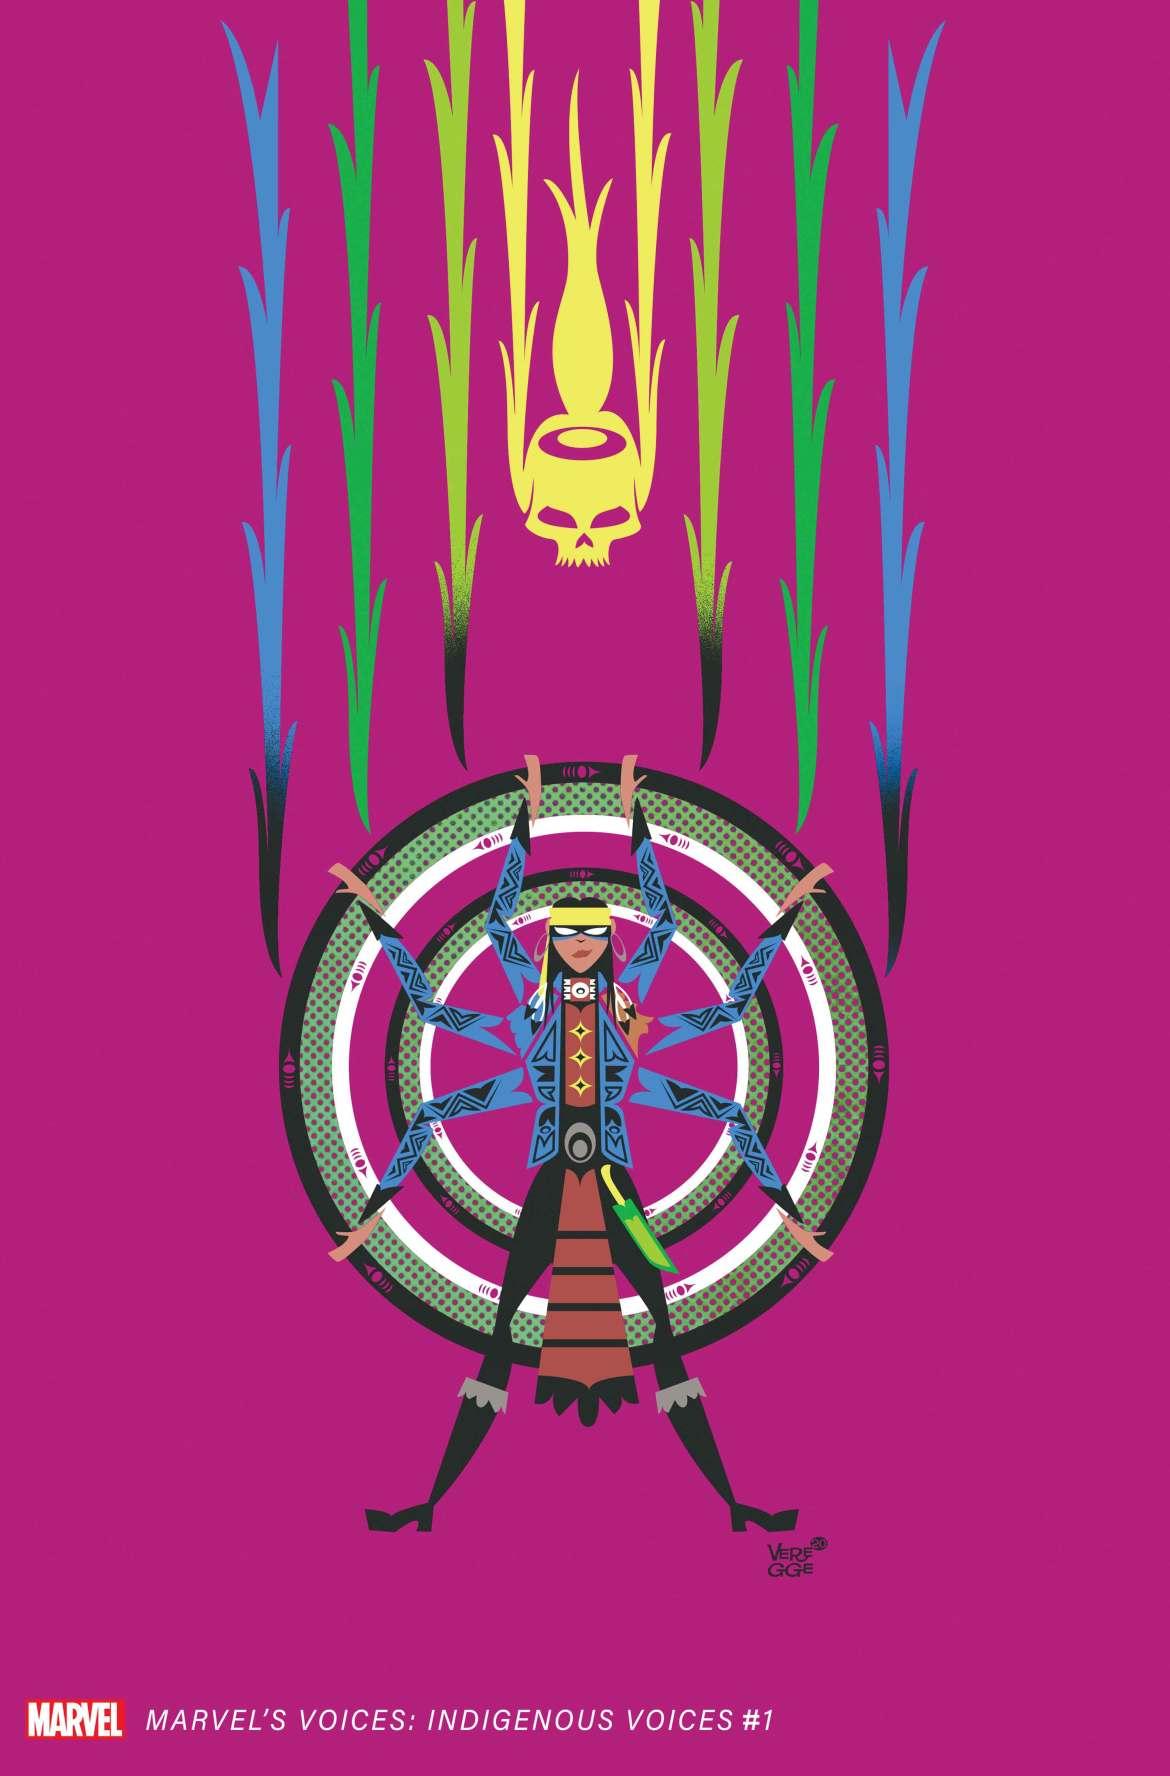 MARINDVOICES2020001_Veregge-Kushala-var Jeffrey Veregge's MARVEL'S VOICES: INDIGENOUS VOICES #1 variant features The Demon Rider